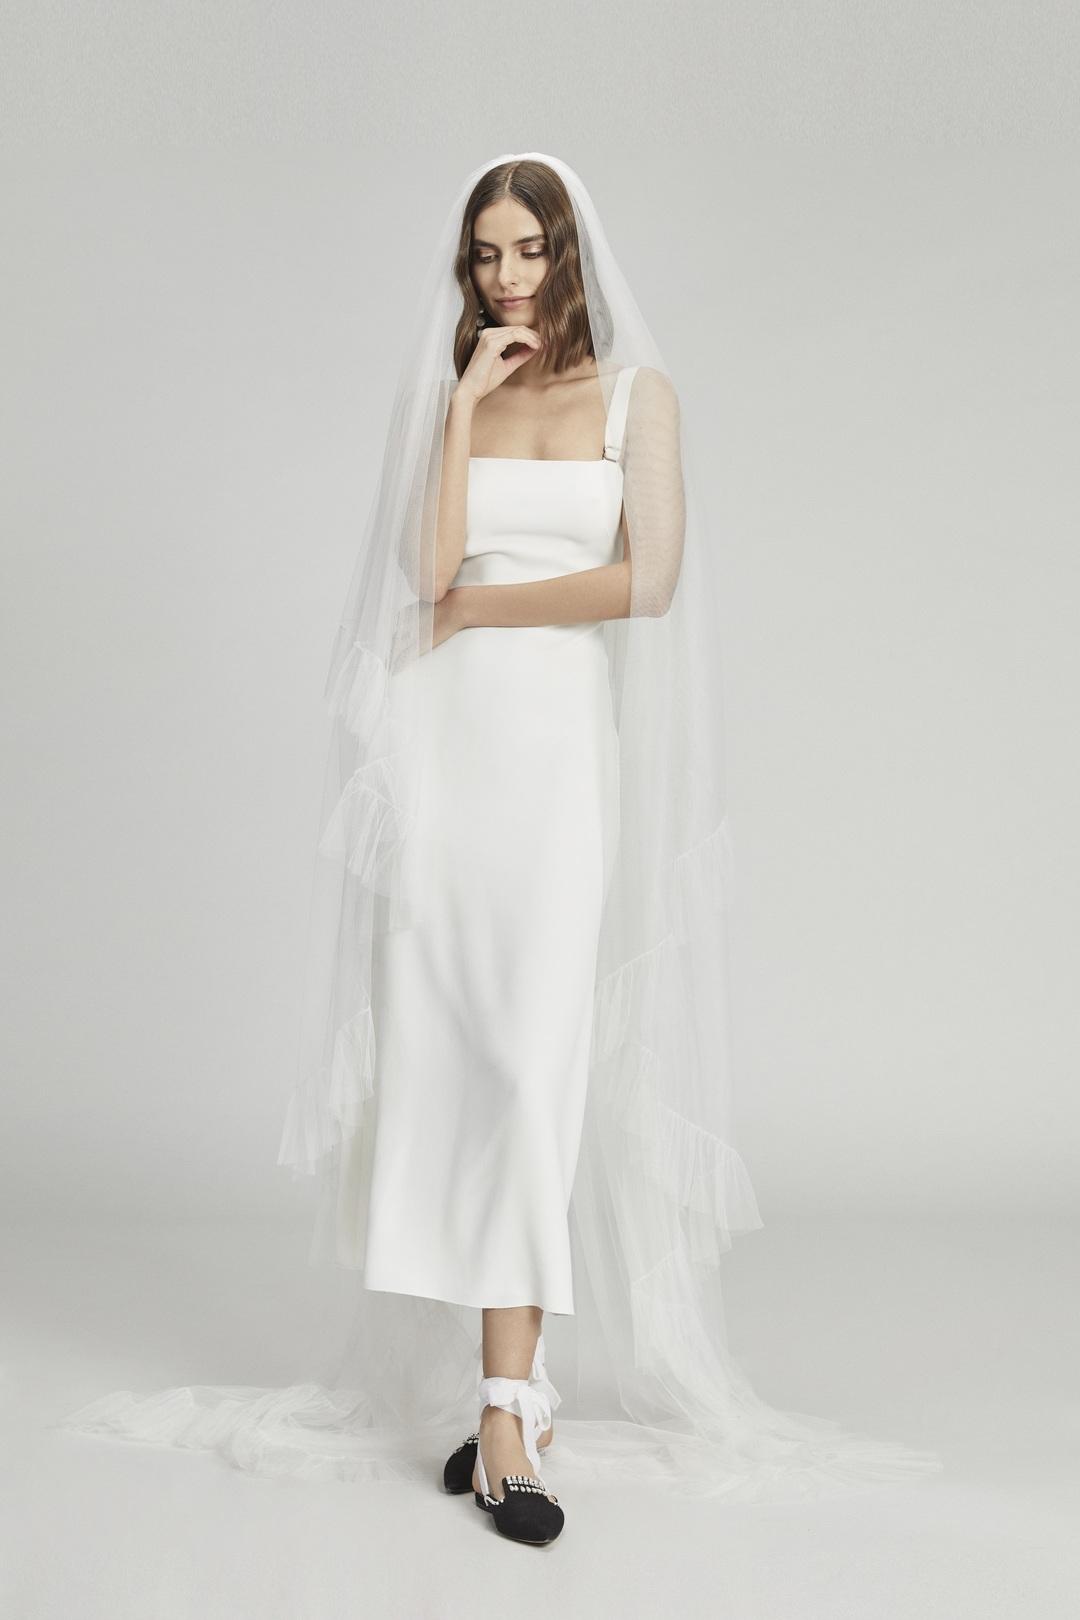 maude  dress photo